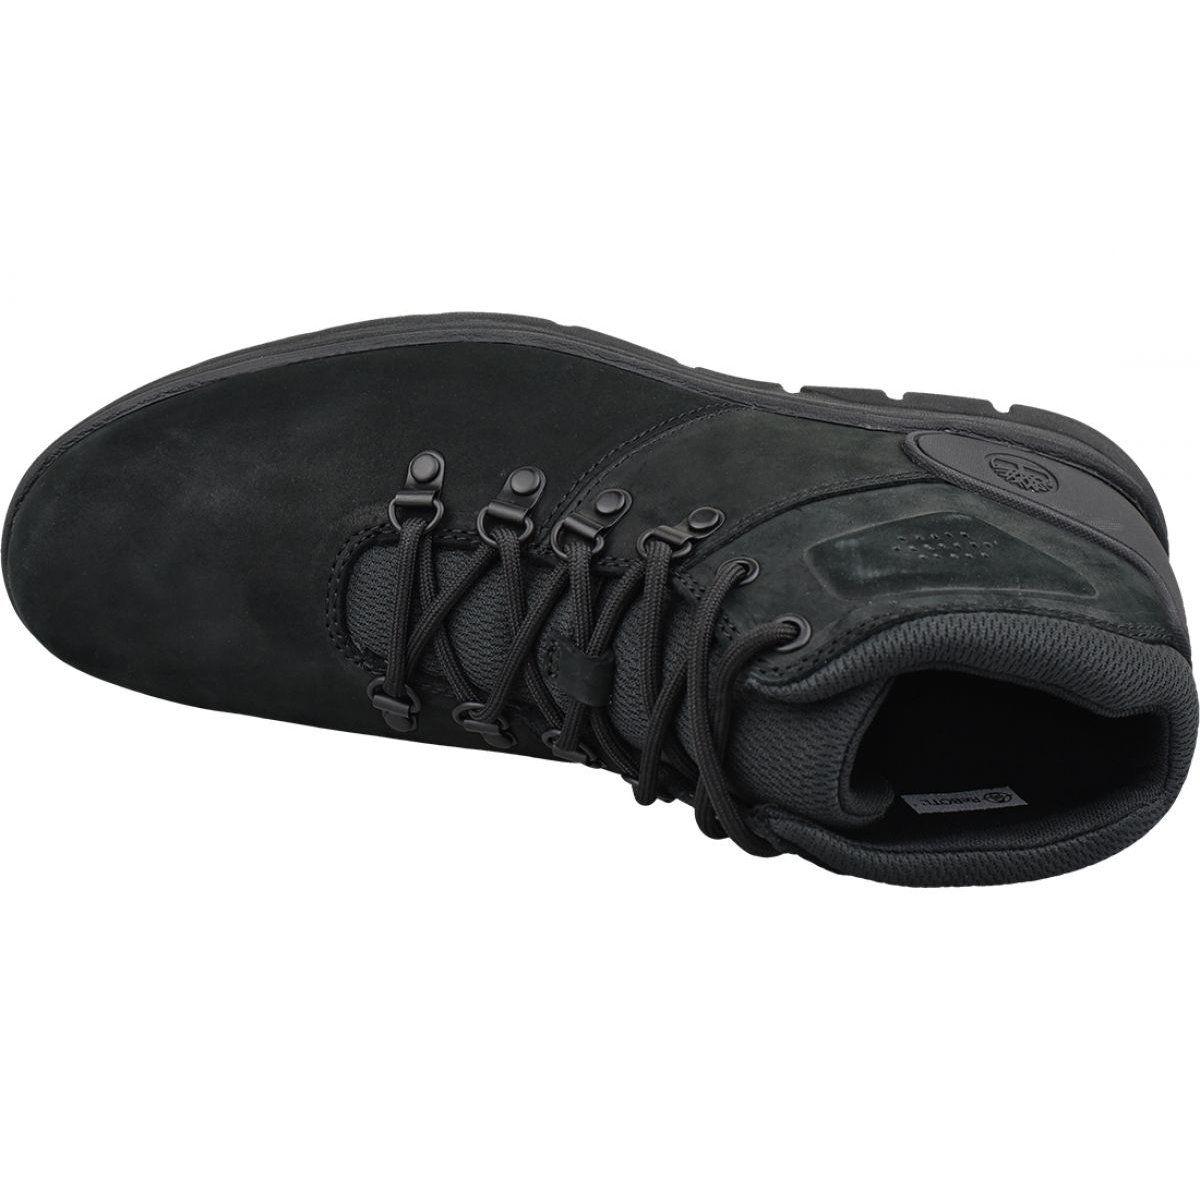 Buty Timberland Bradstreet Hiker M A26zb Czarne Sport Shoes Men Nubuck Leather Black Shoes